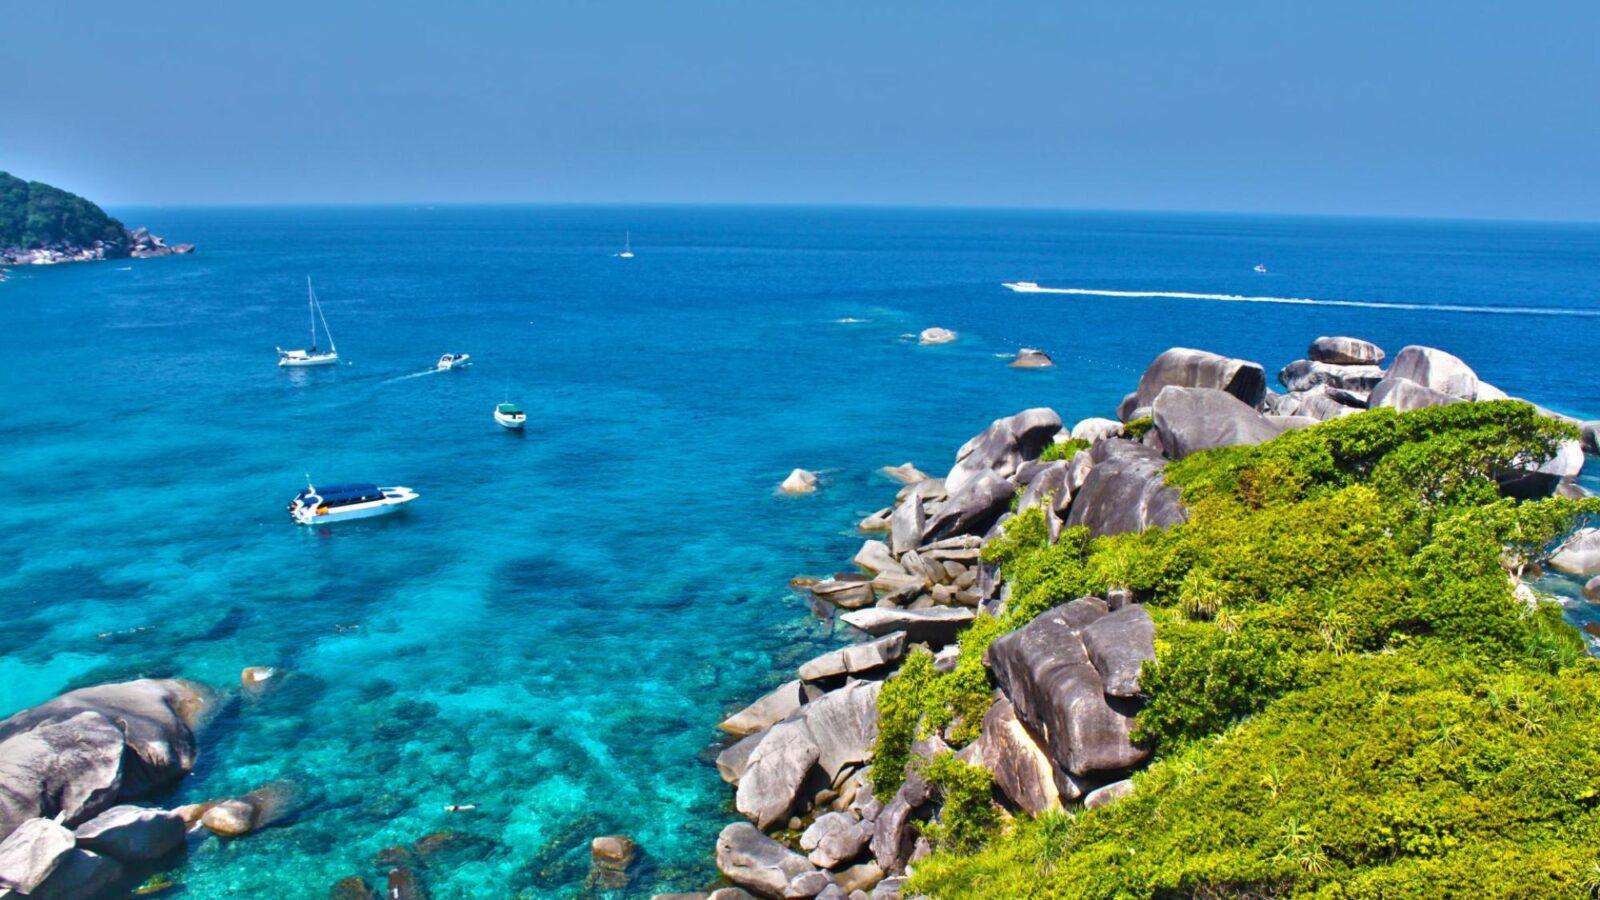 Фото Симилианских островов